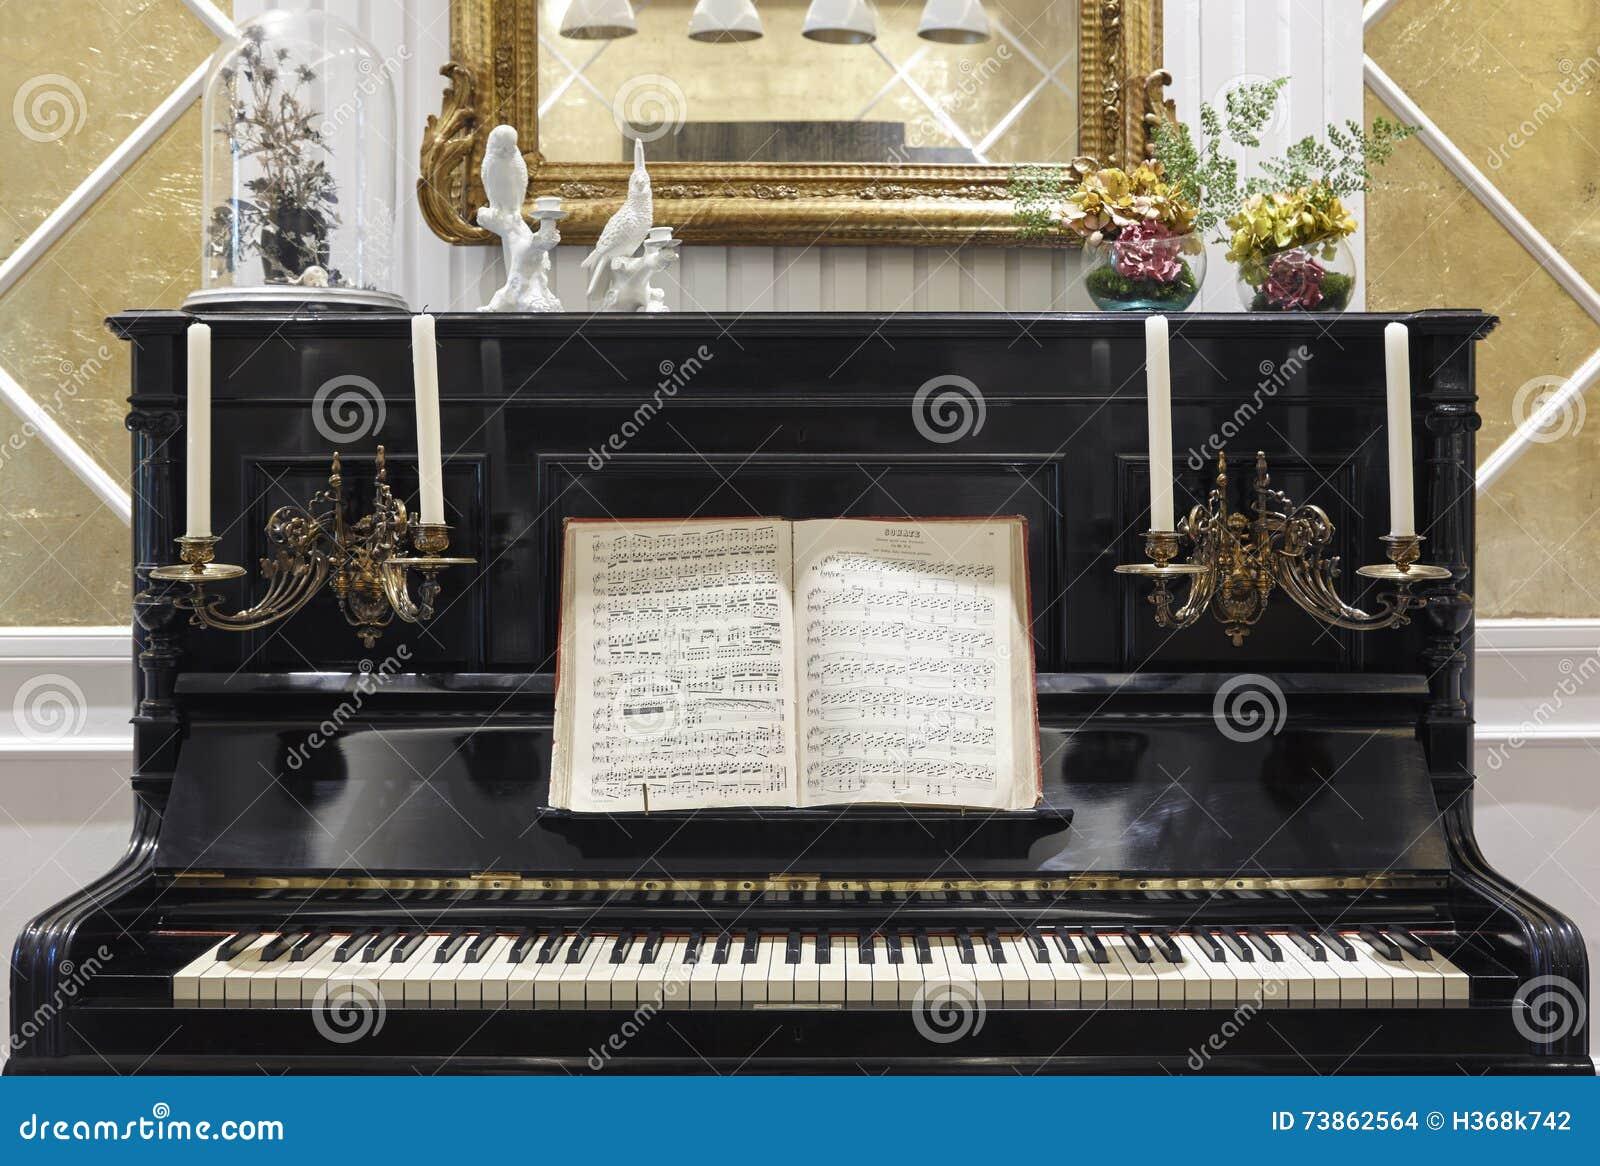 Antikes Klavier Mit Kerzen Und Partitur Innendekoration Stockfoto ...